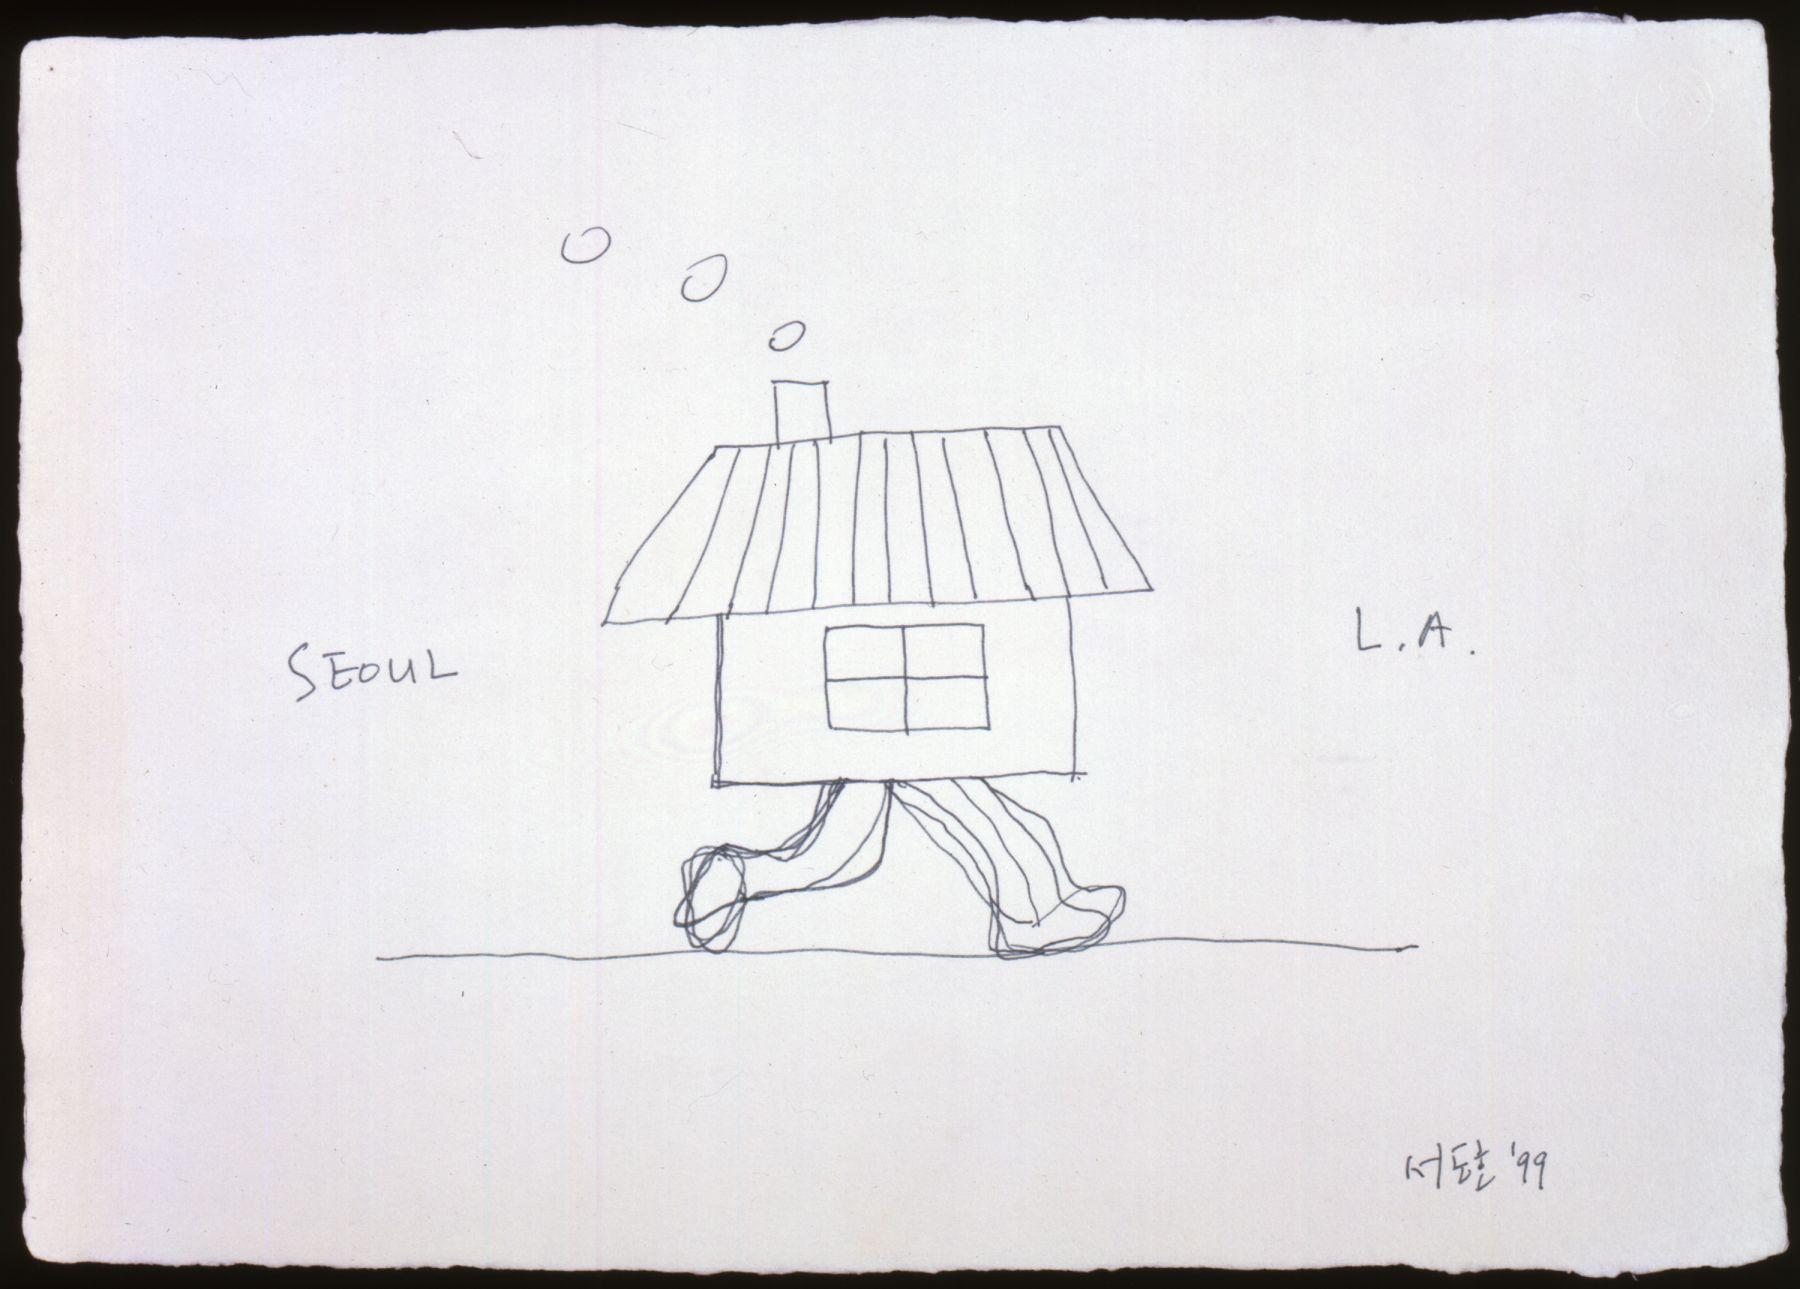 DO HO SUH, Seoul Home/L.A. Home, 1999